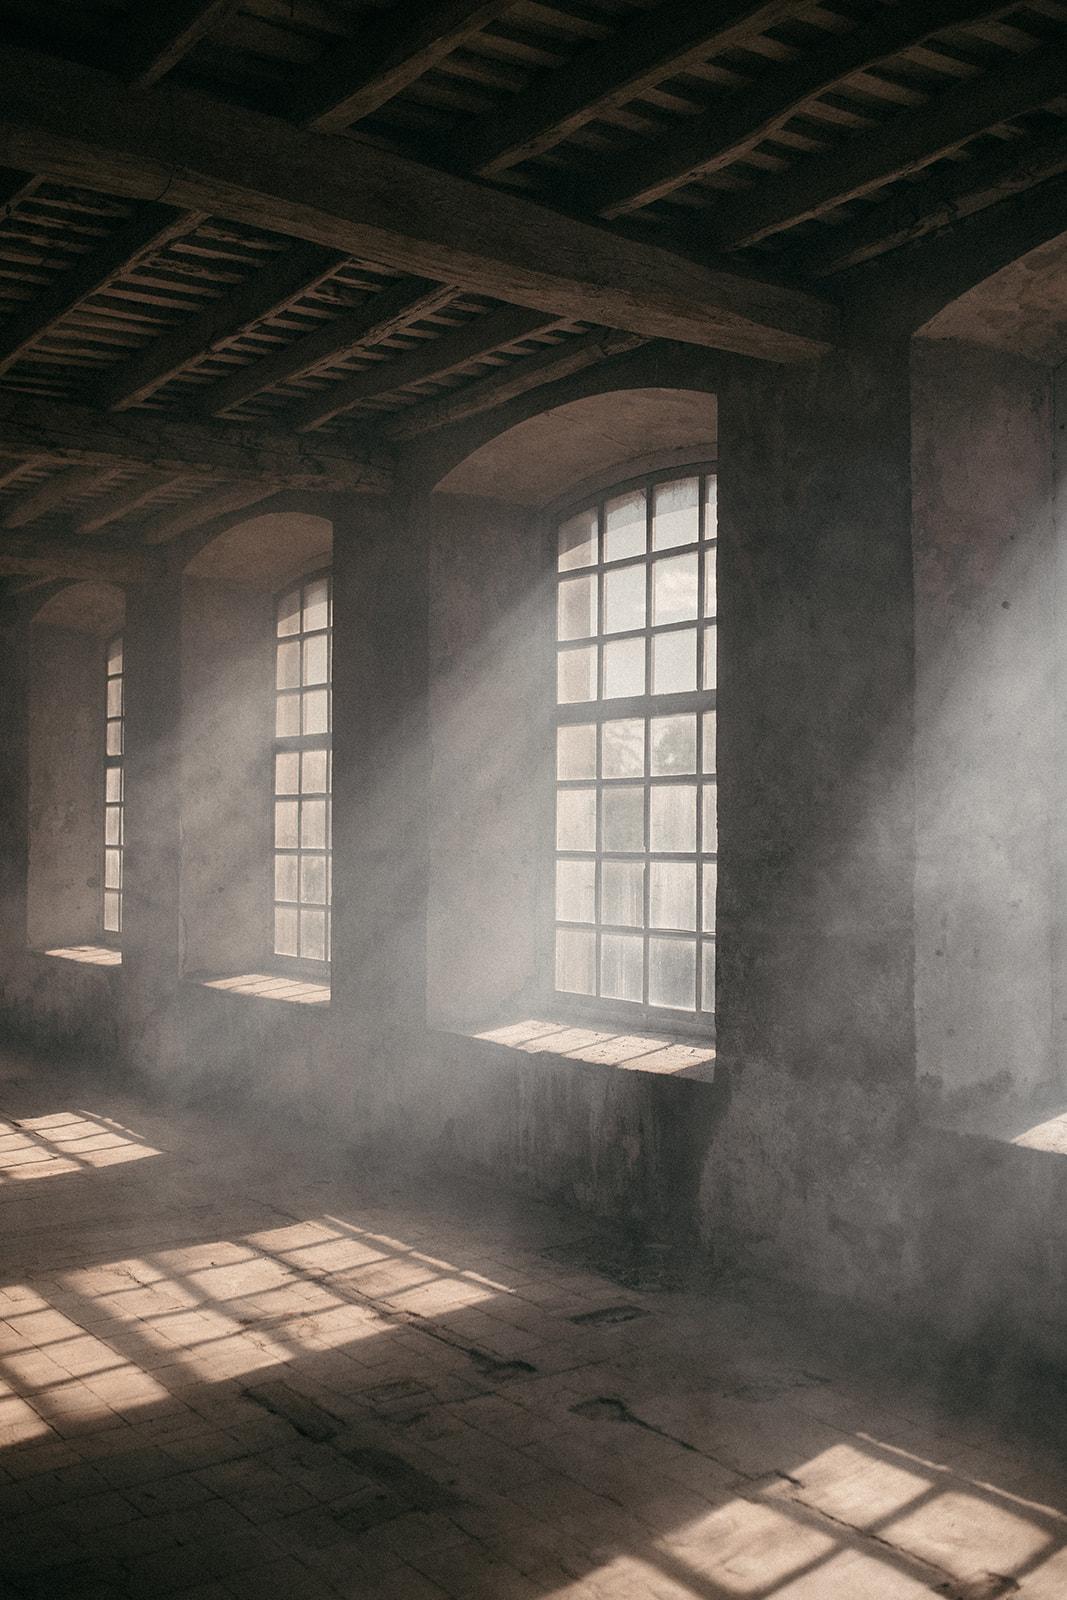 Abandoned Factory Story By Dos Santas